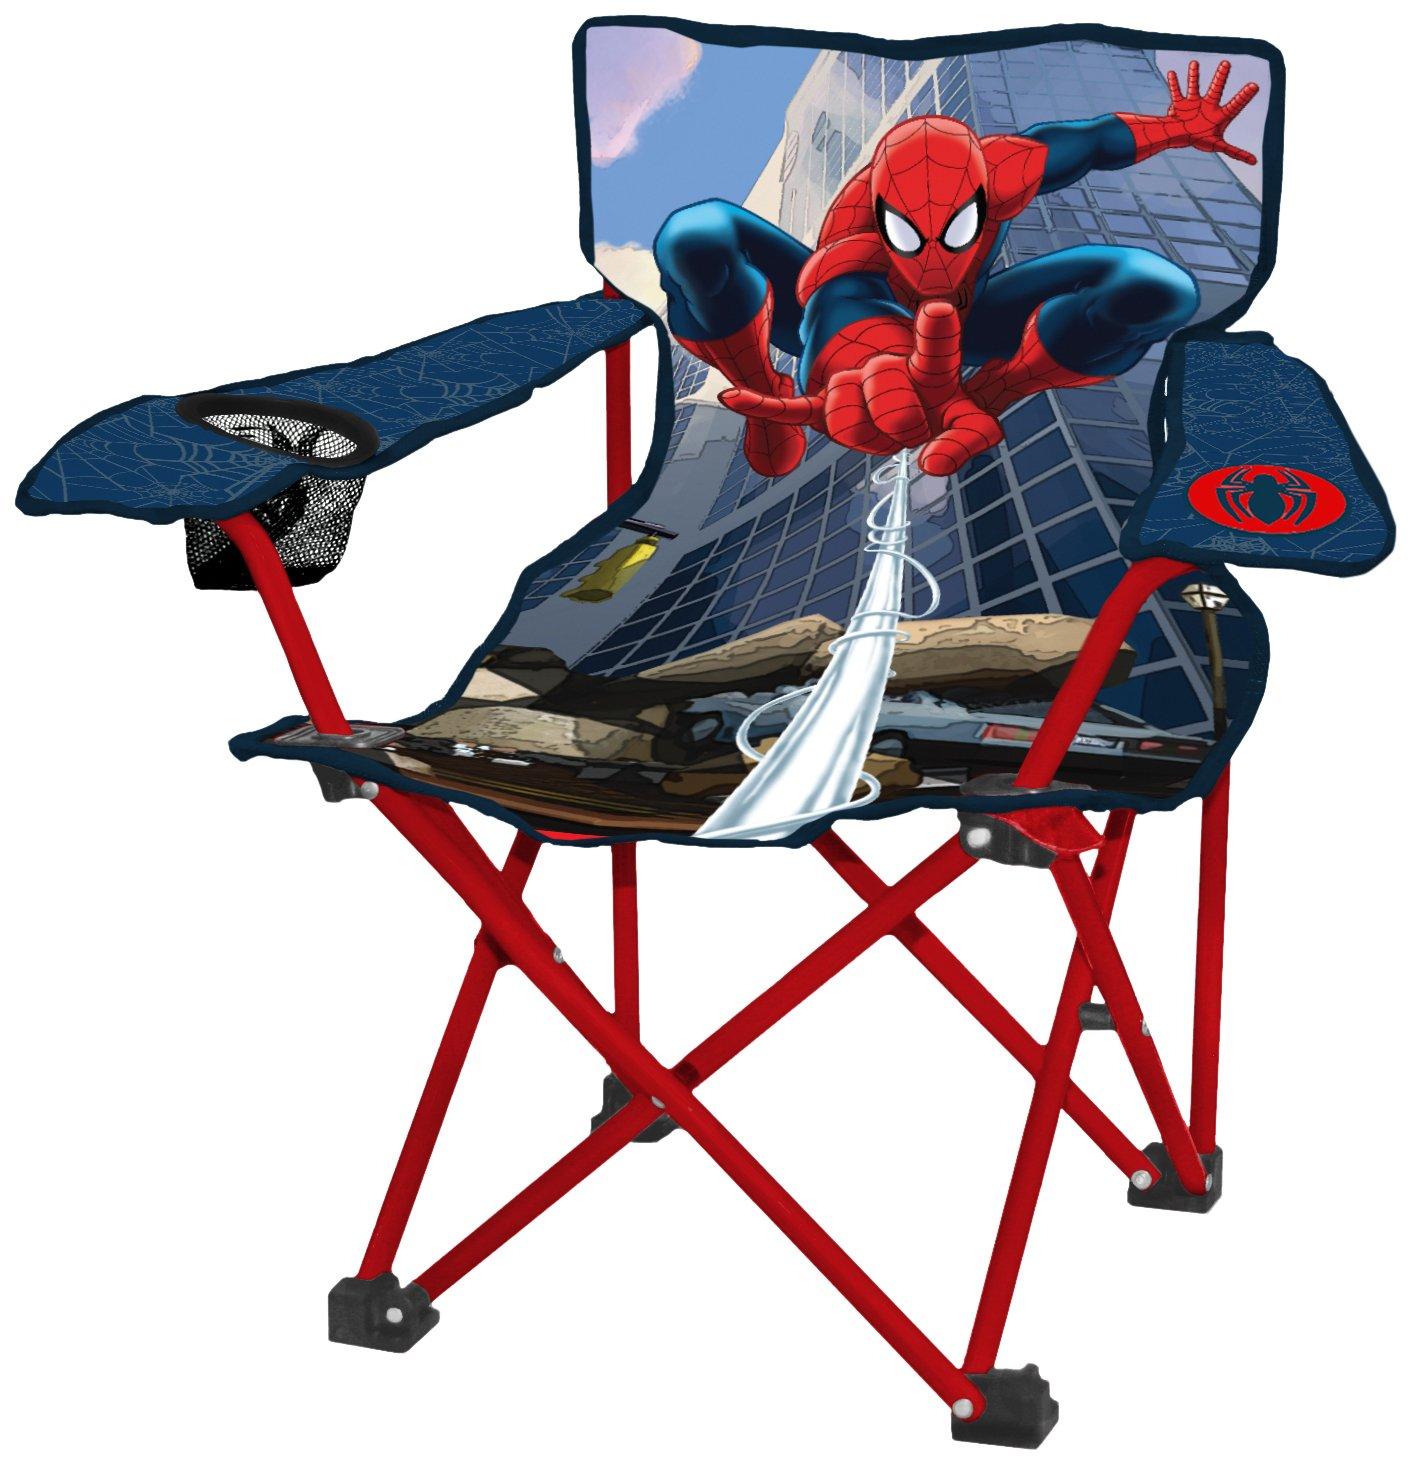 Spiderman Kid's Camp Chair 24071